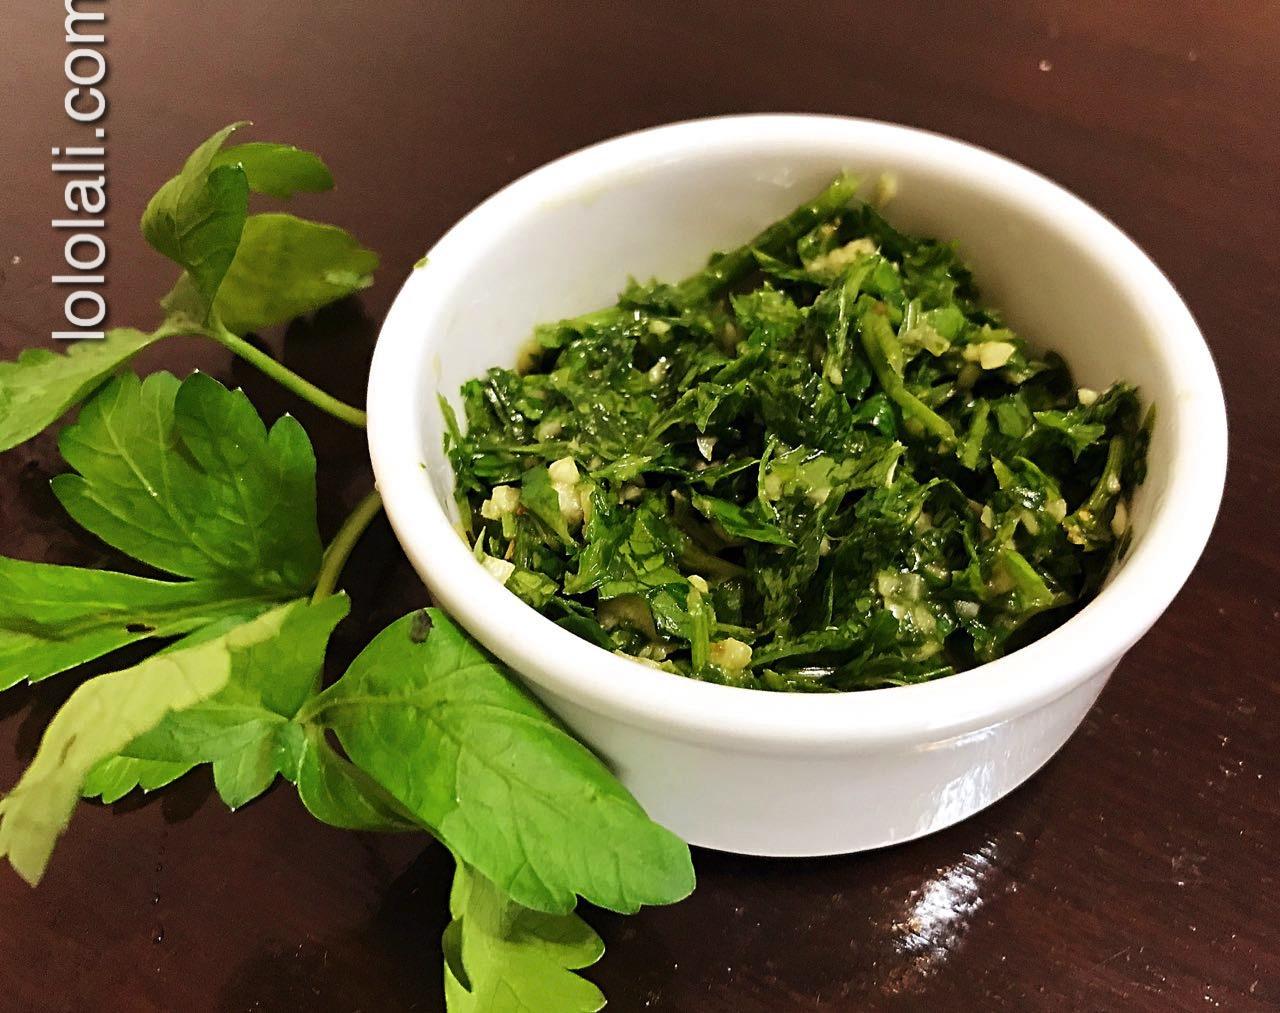 ¿Cómo preparar Chimichurri? – Receta